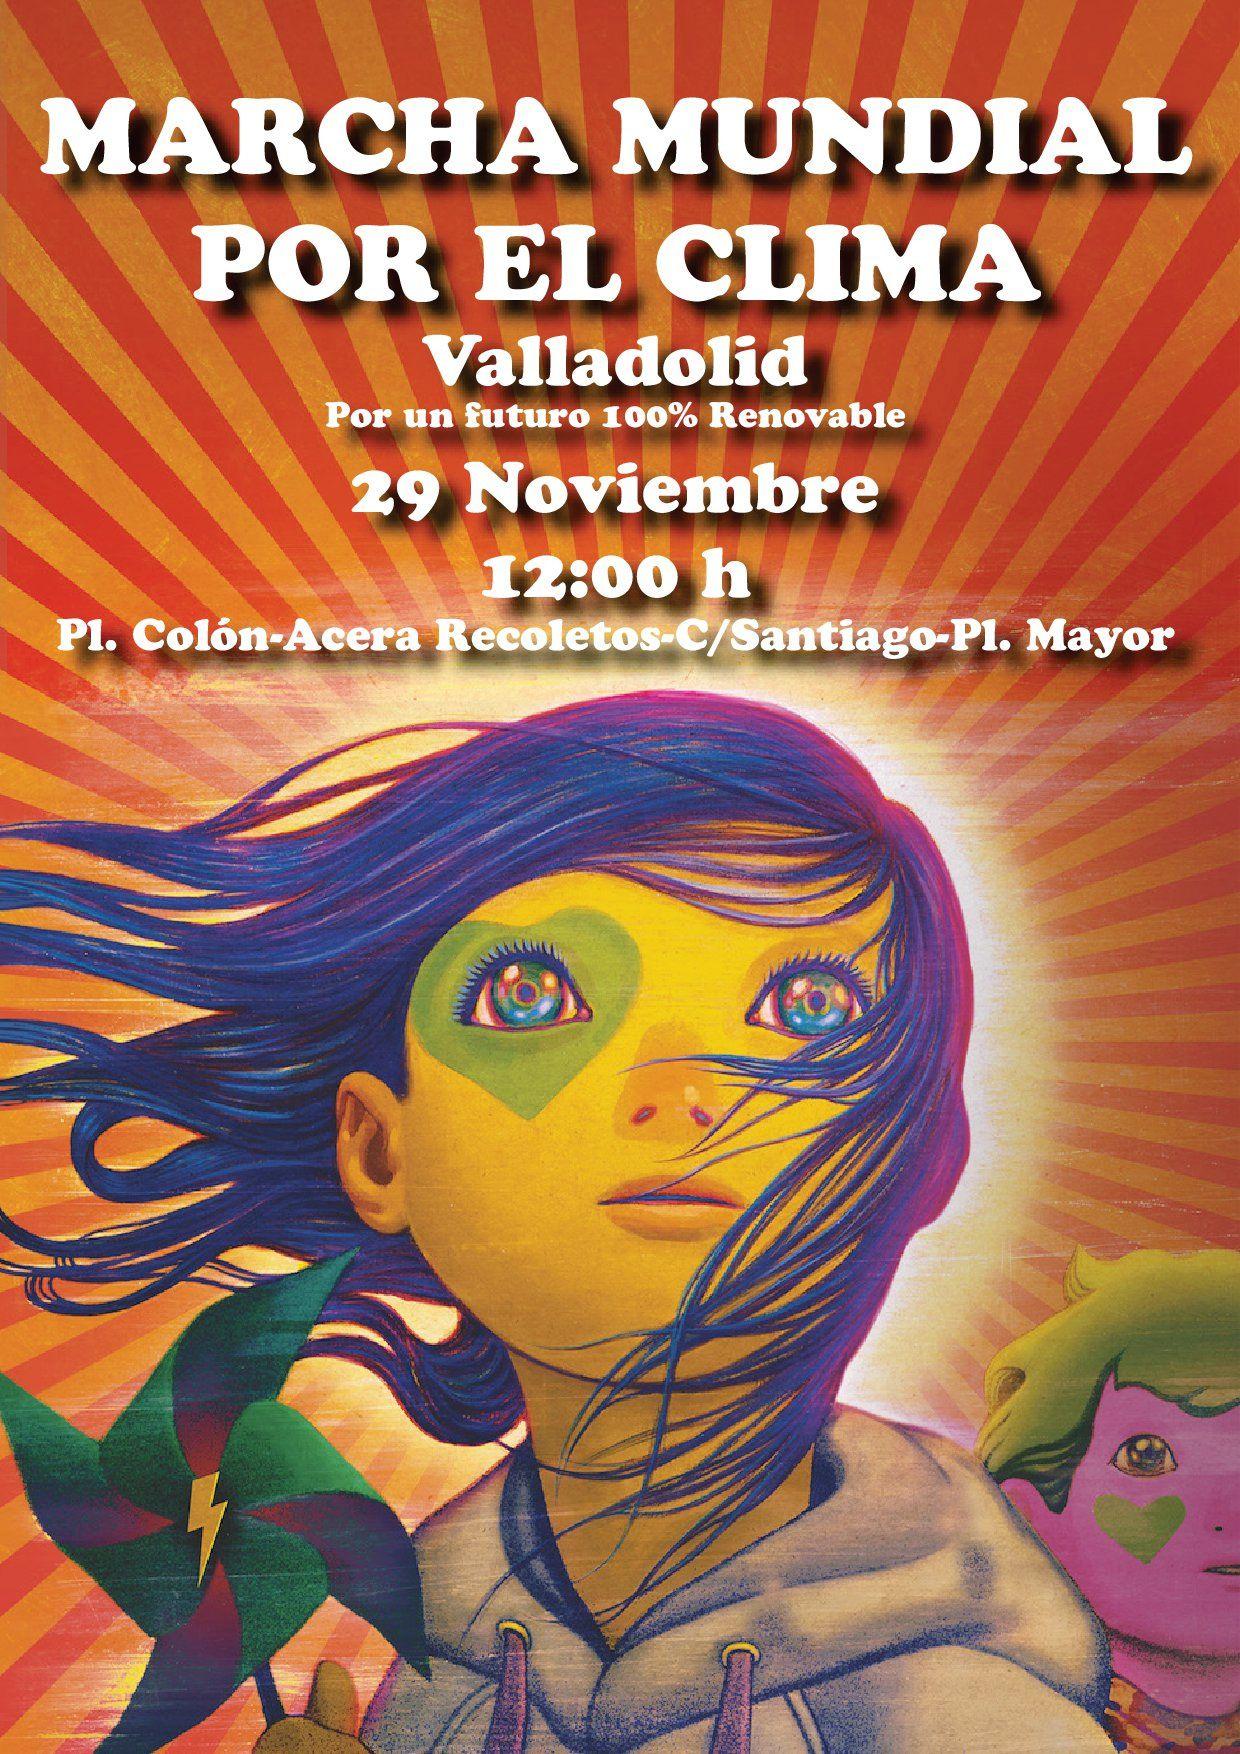 Marcha_Mundial_Clima_va